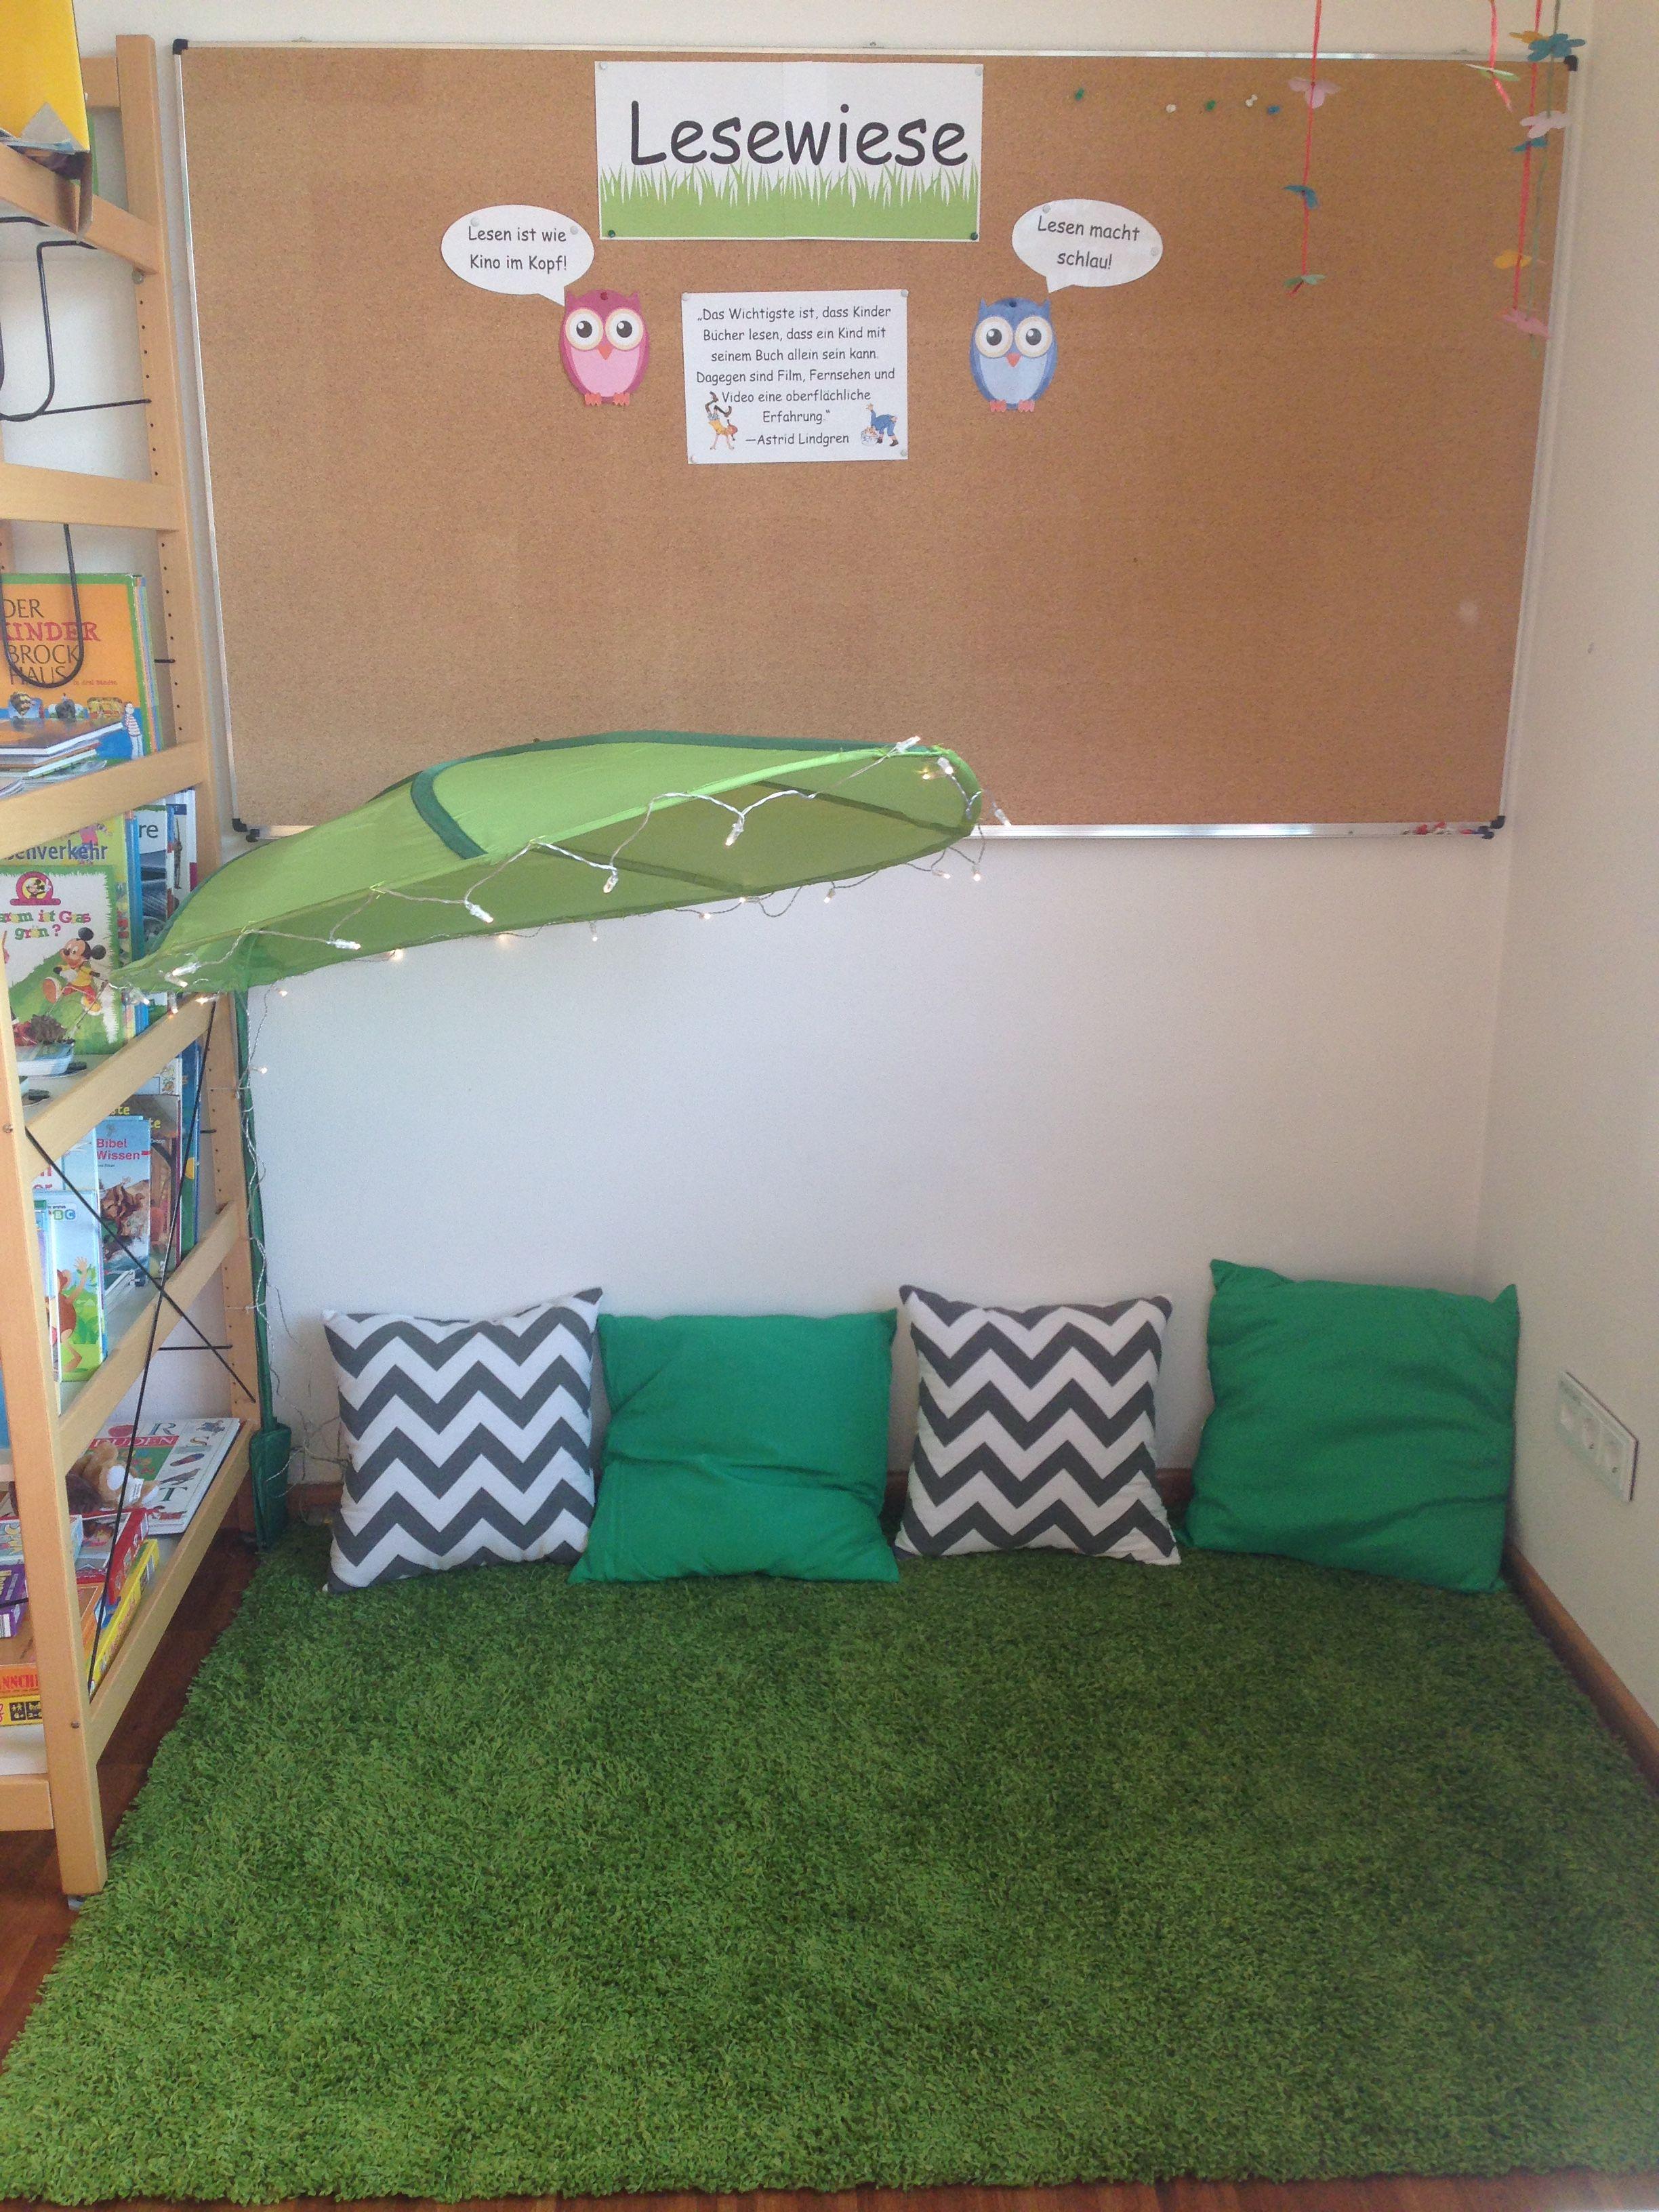 meine leseecke 3 klasse klassenzimmer klassenzimmer. Black Bedroom Furniture Sets. Home Design Ideas